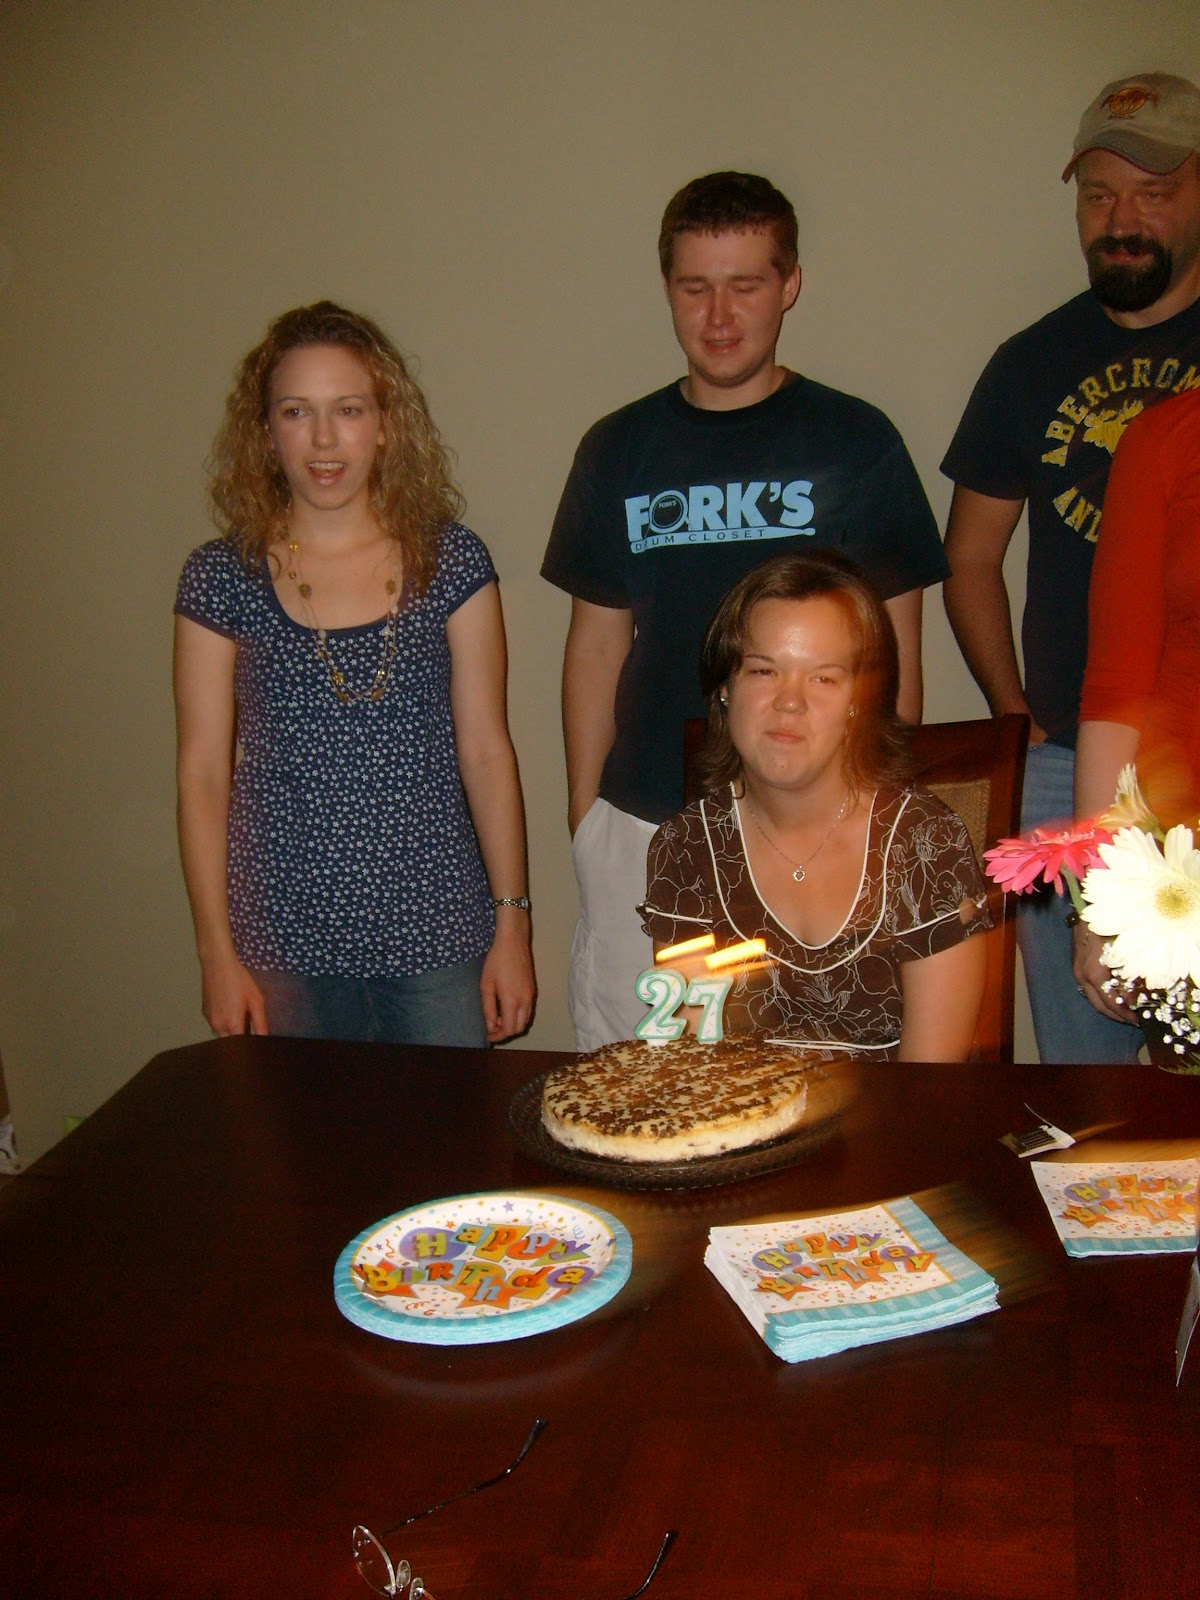 Kims 27th Birthday Party - S7300359.JPG